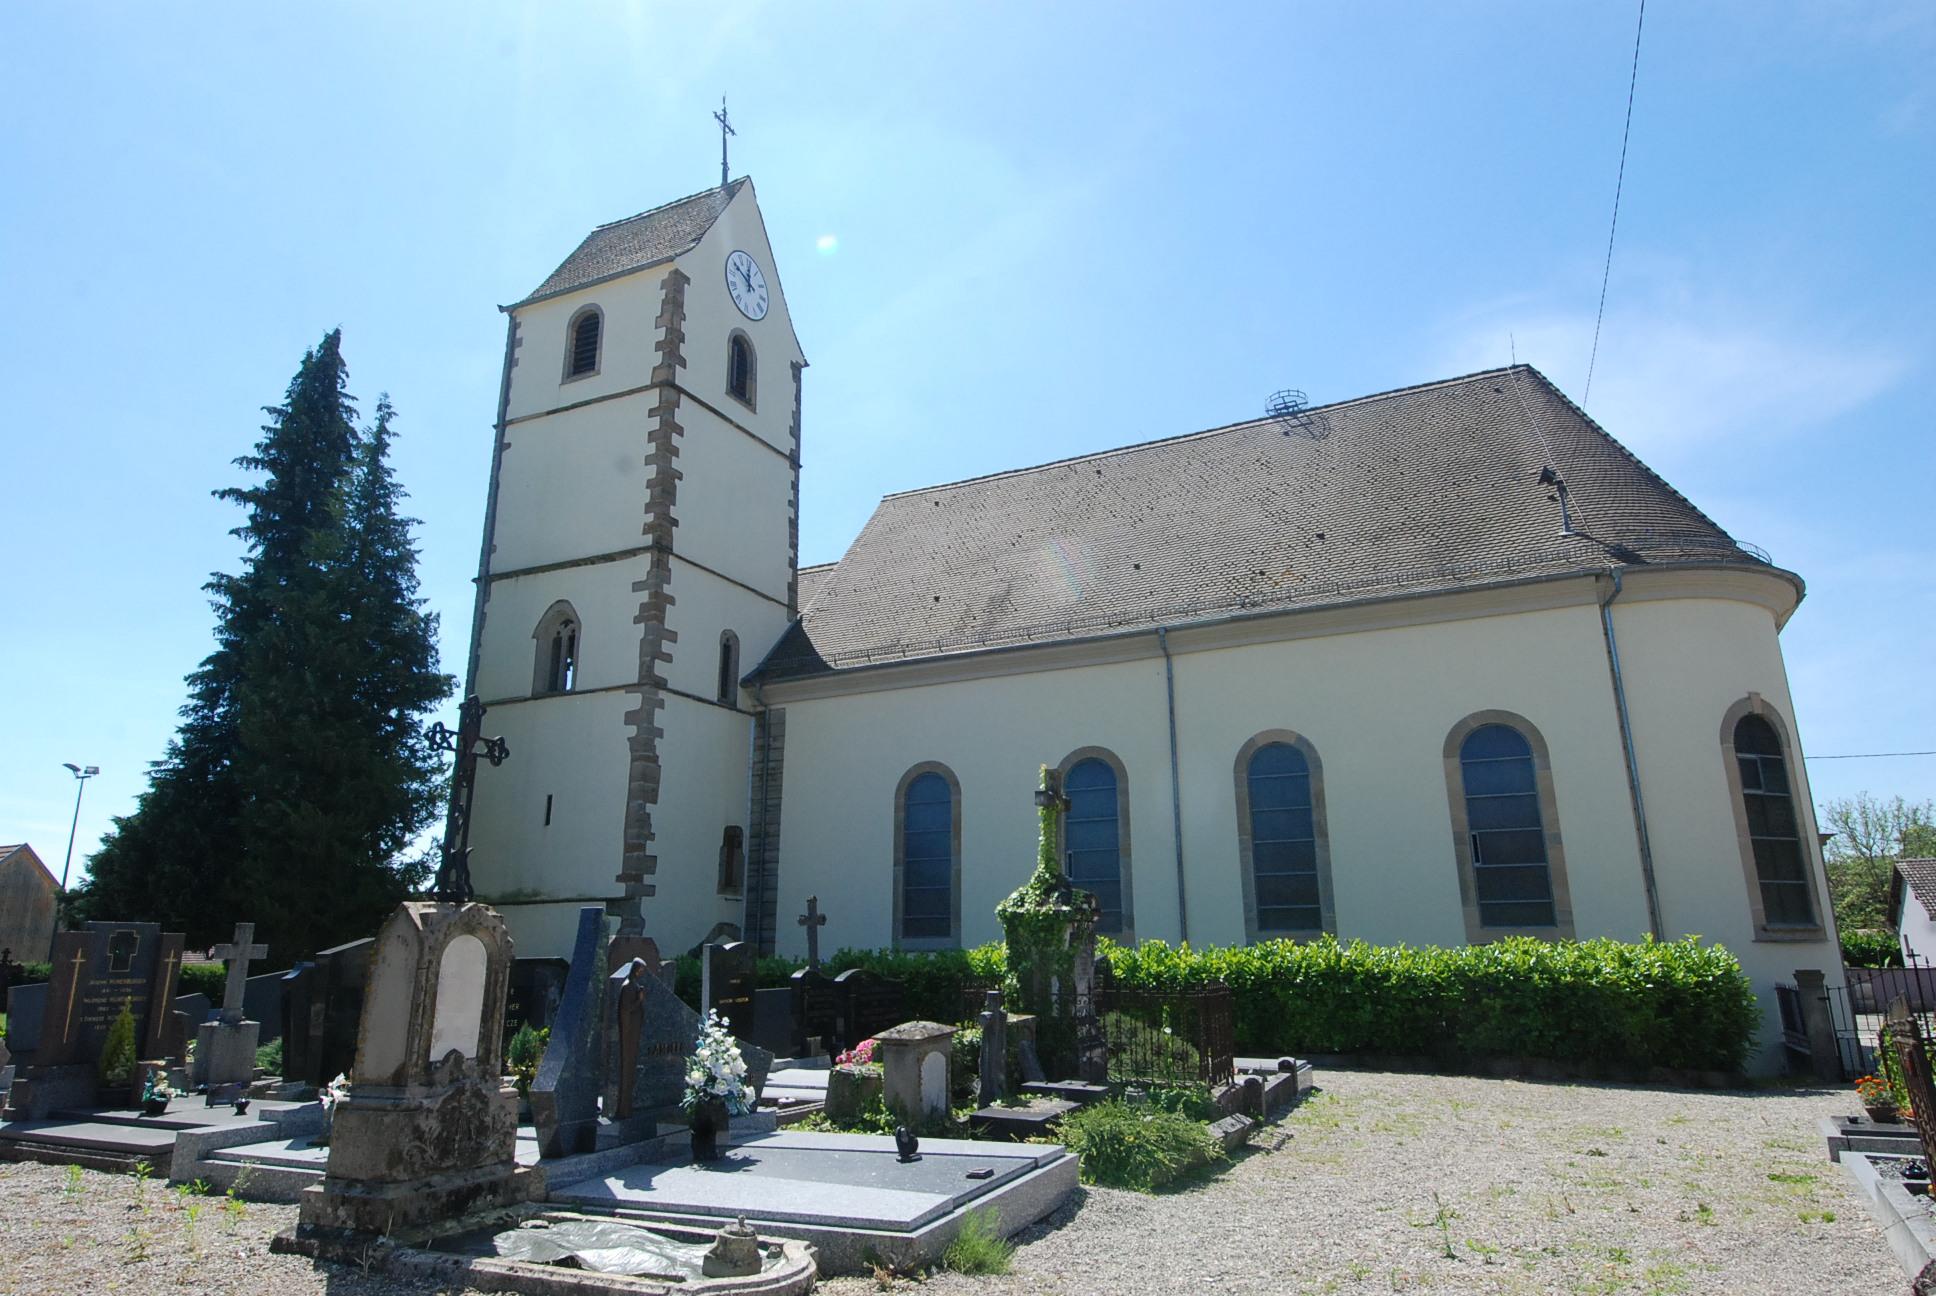 Cimetière de Zimmersheim